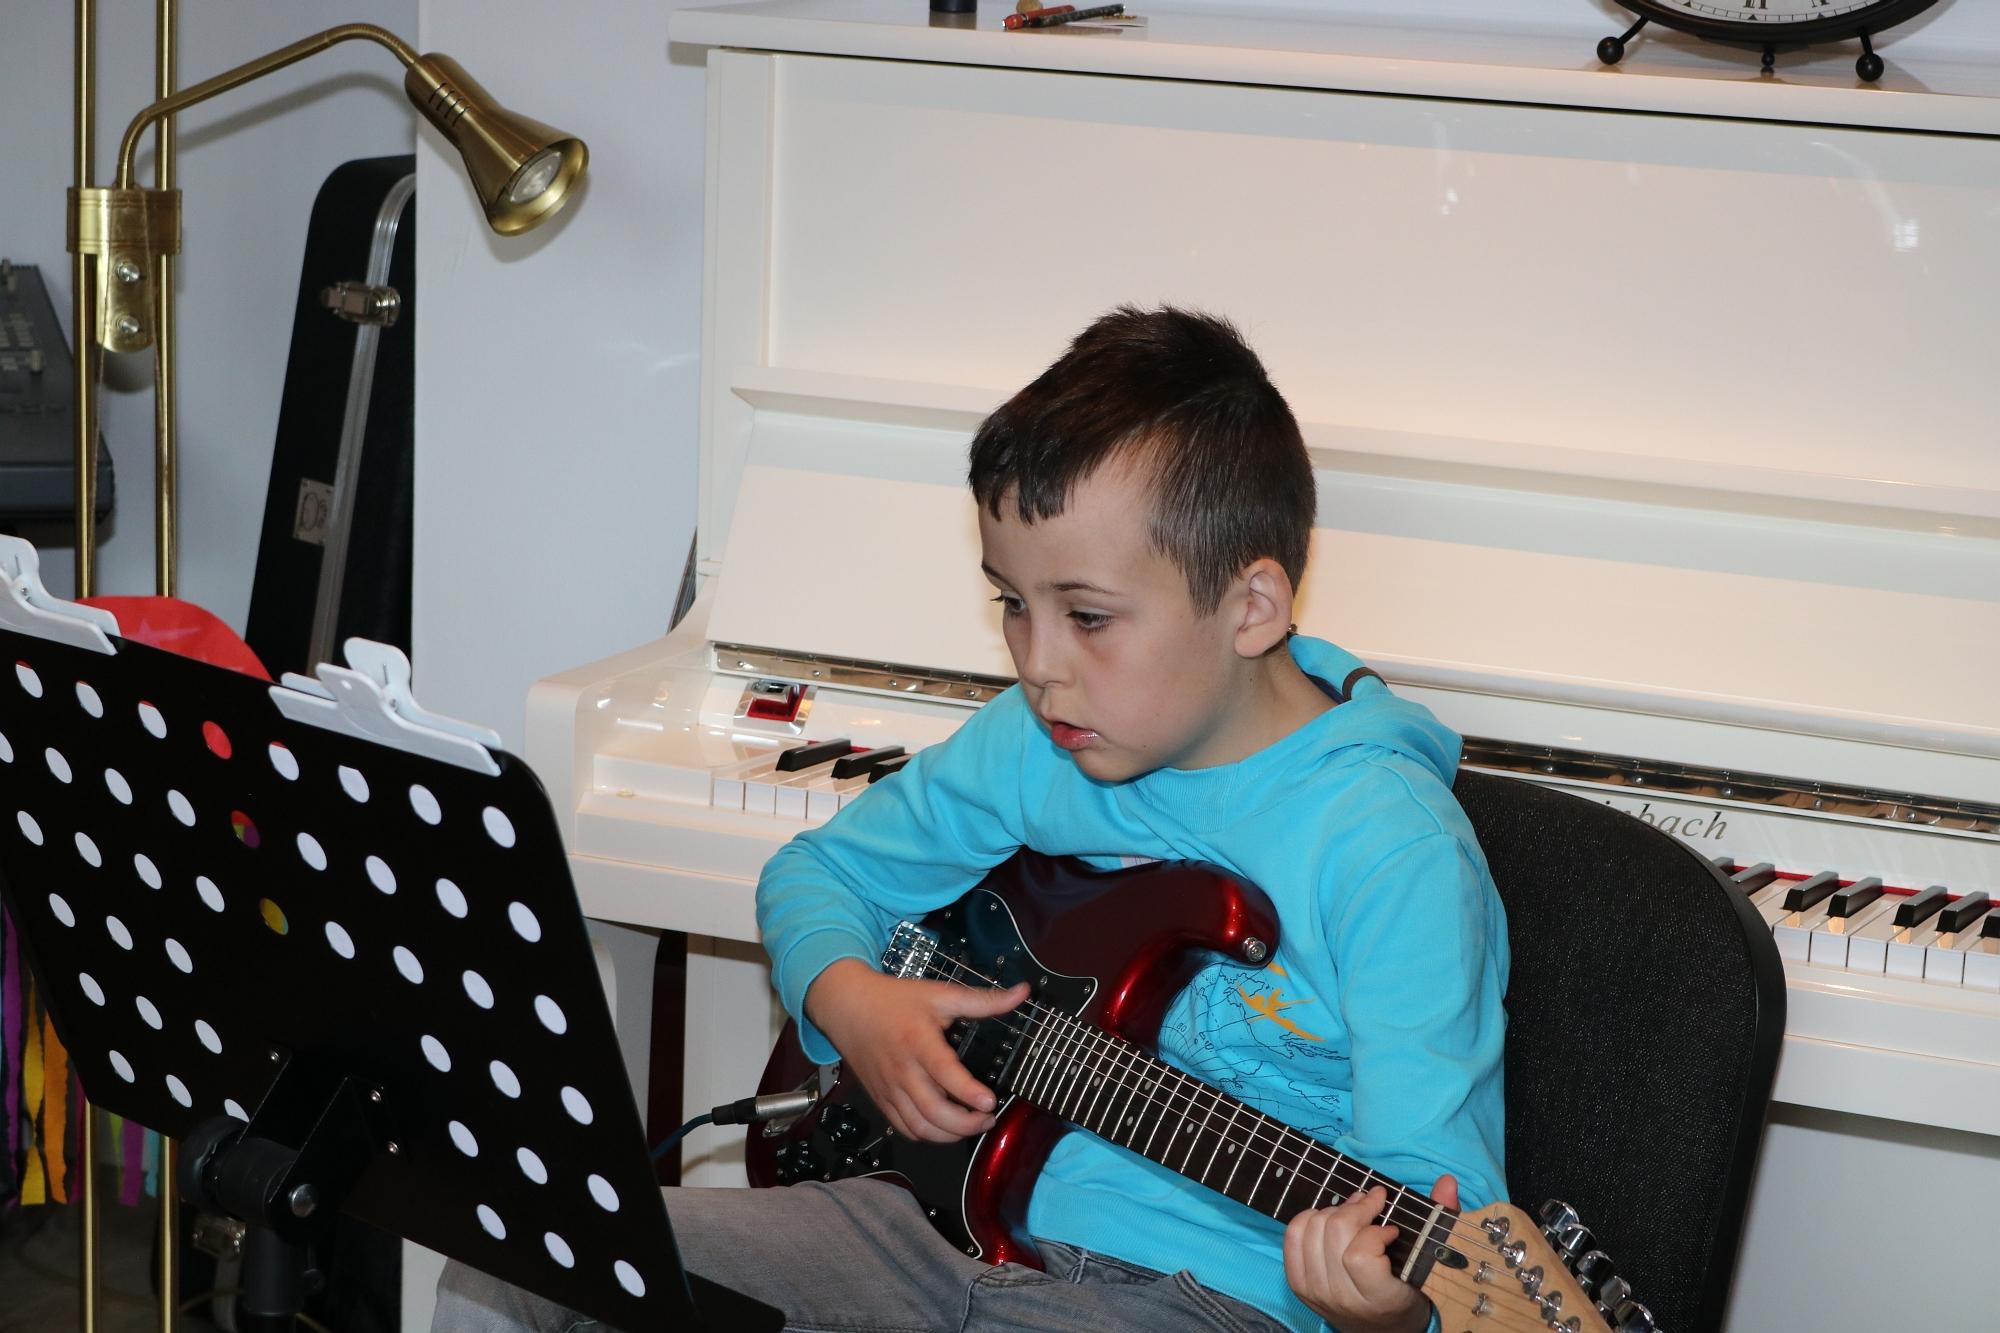 202007 Bandprobe FP Musikschule Harmonie 17